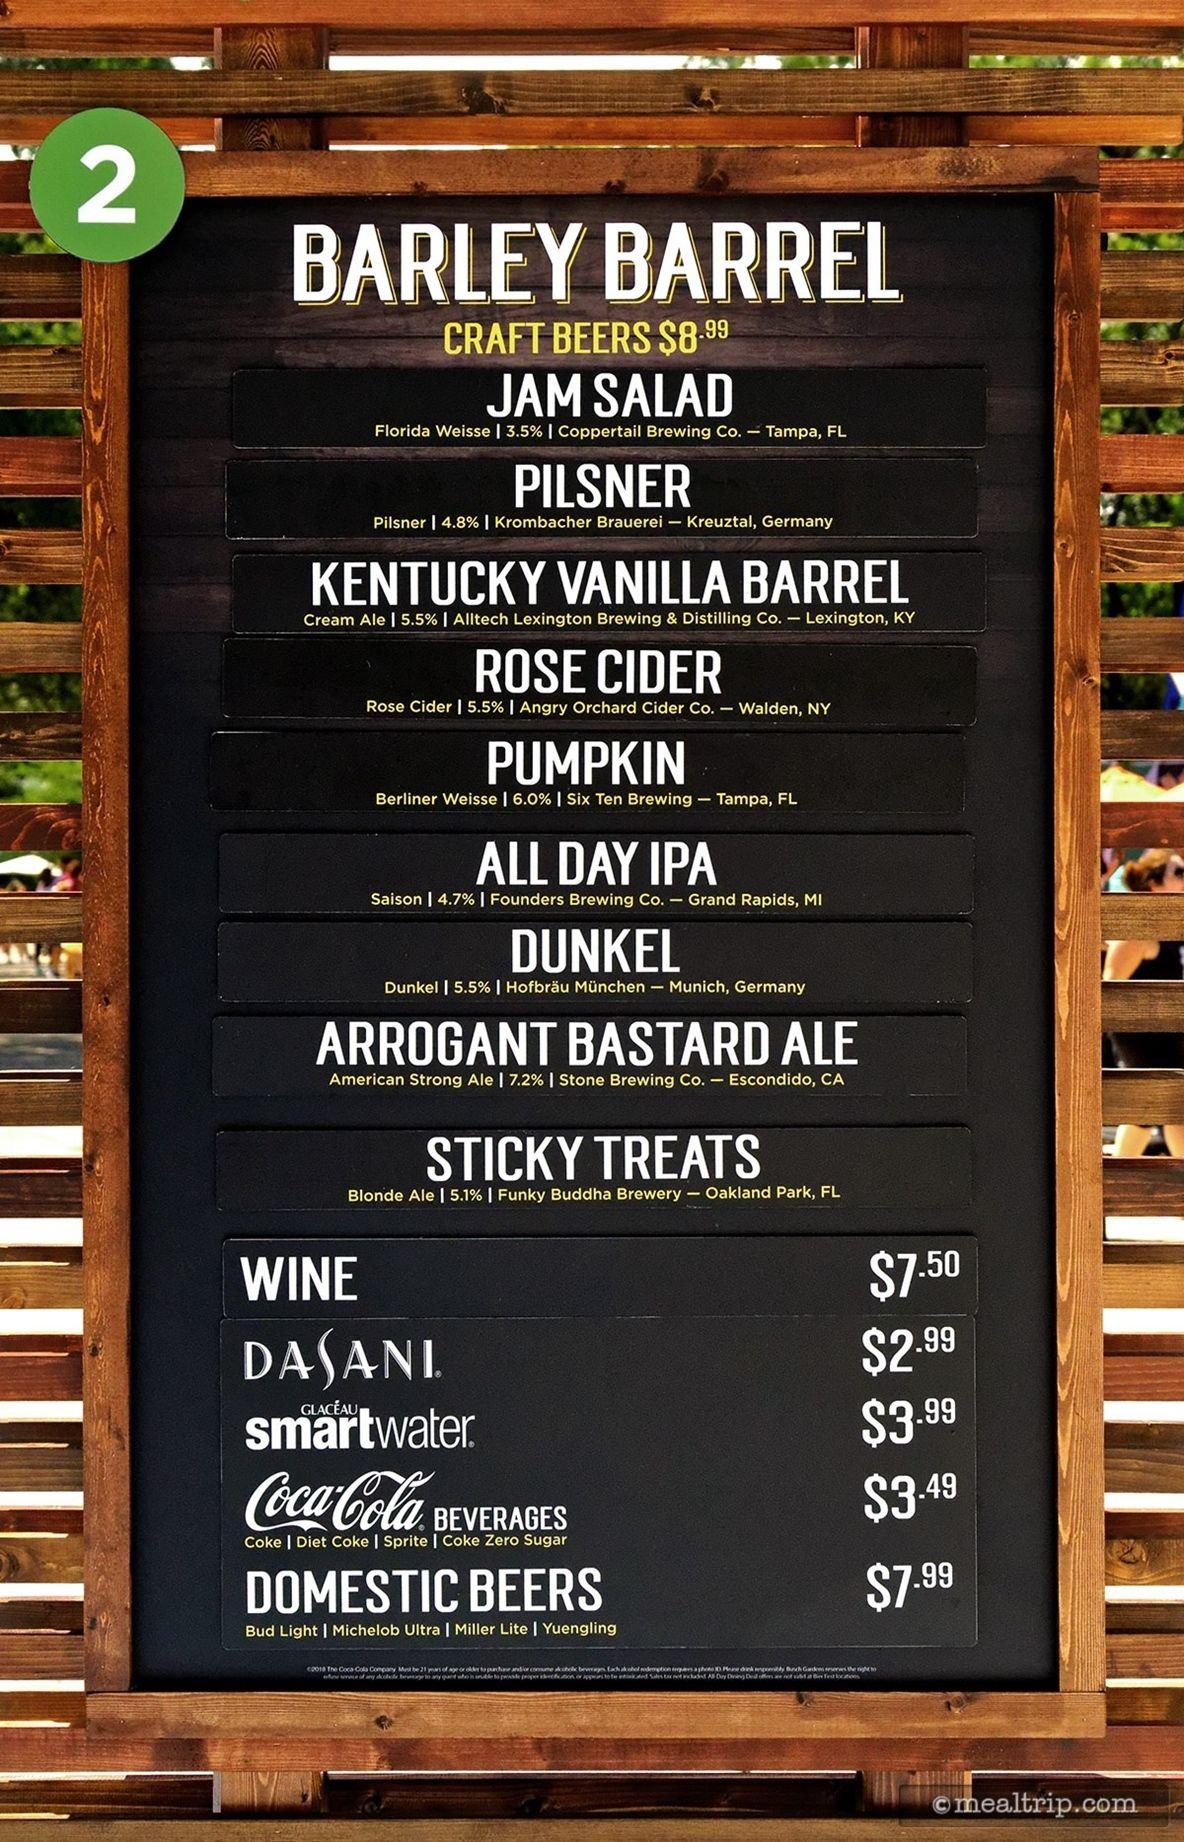 The Barley Barrel menu and price board for Bier Fest 2018